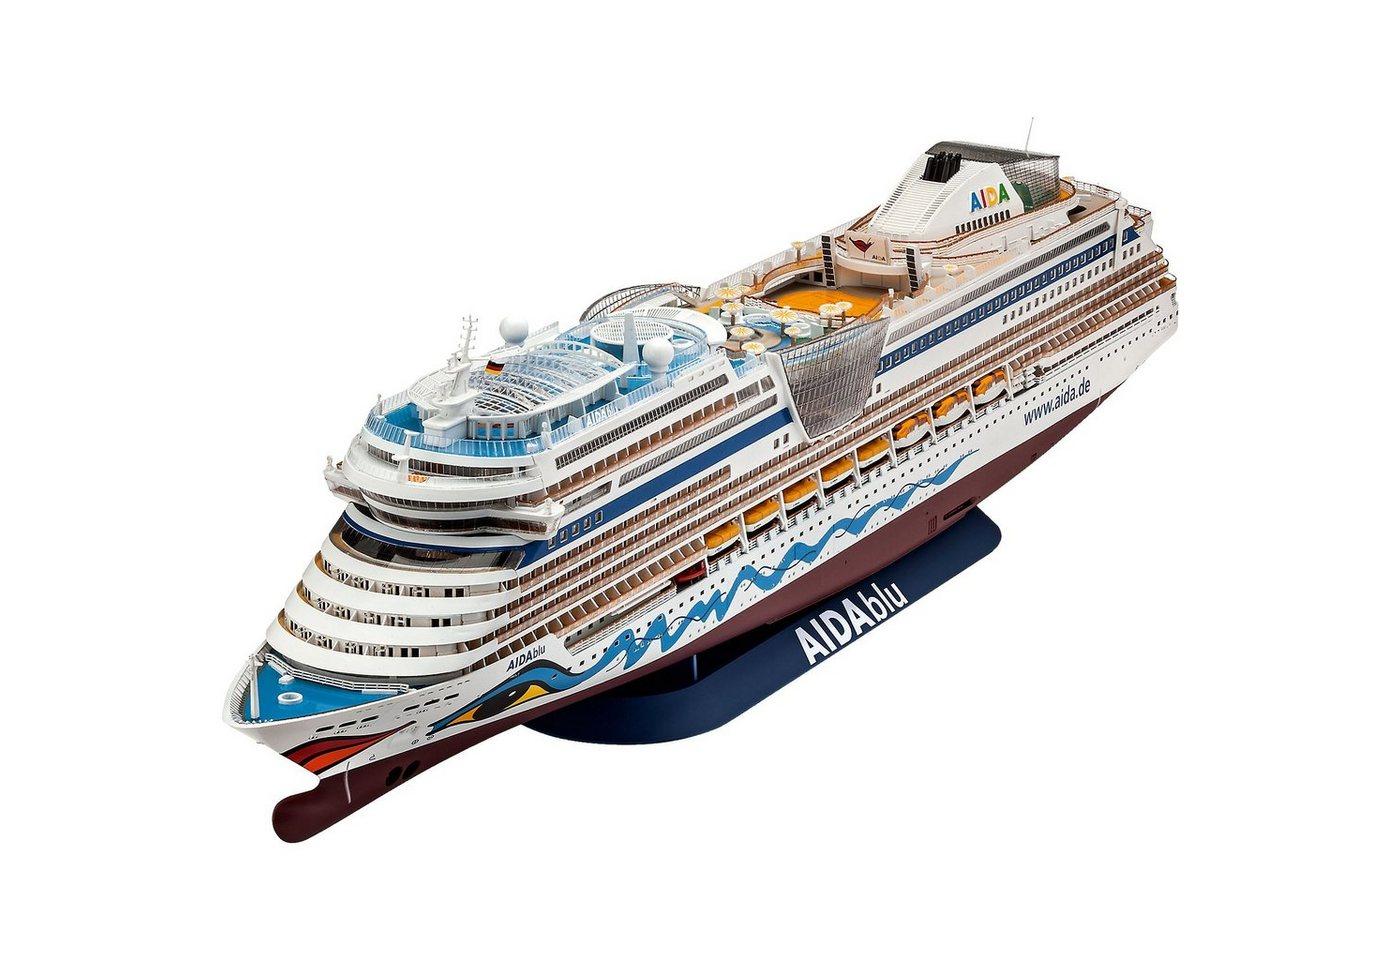 Revell® Modellbausatz Cruiser Ship AIDA im Maßstab 1:400